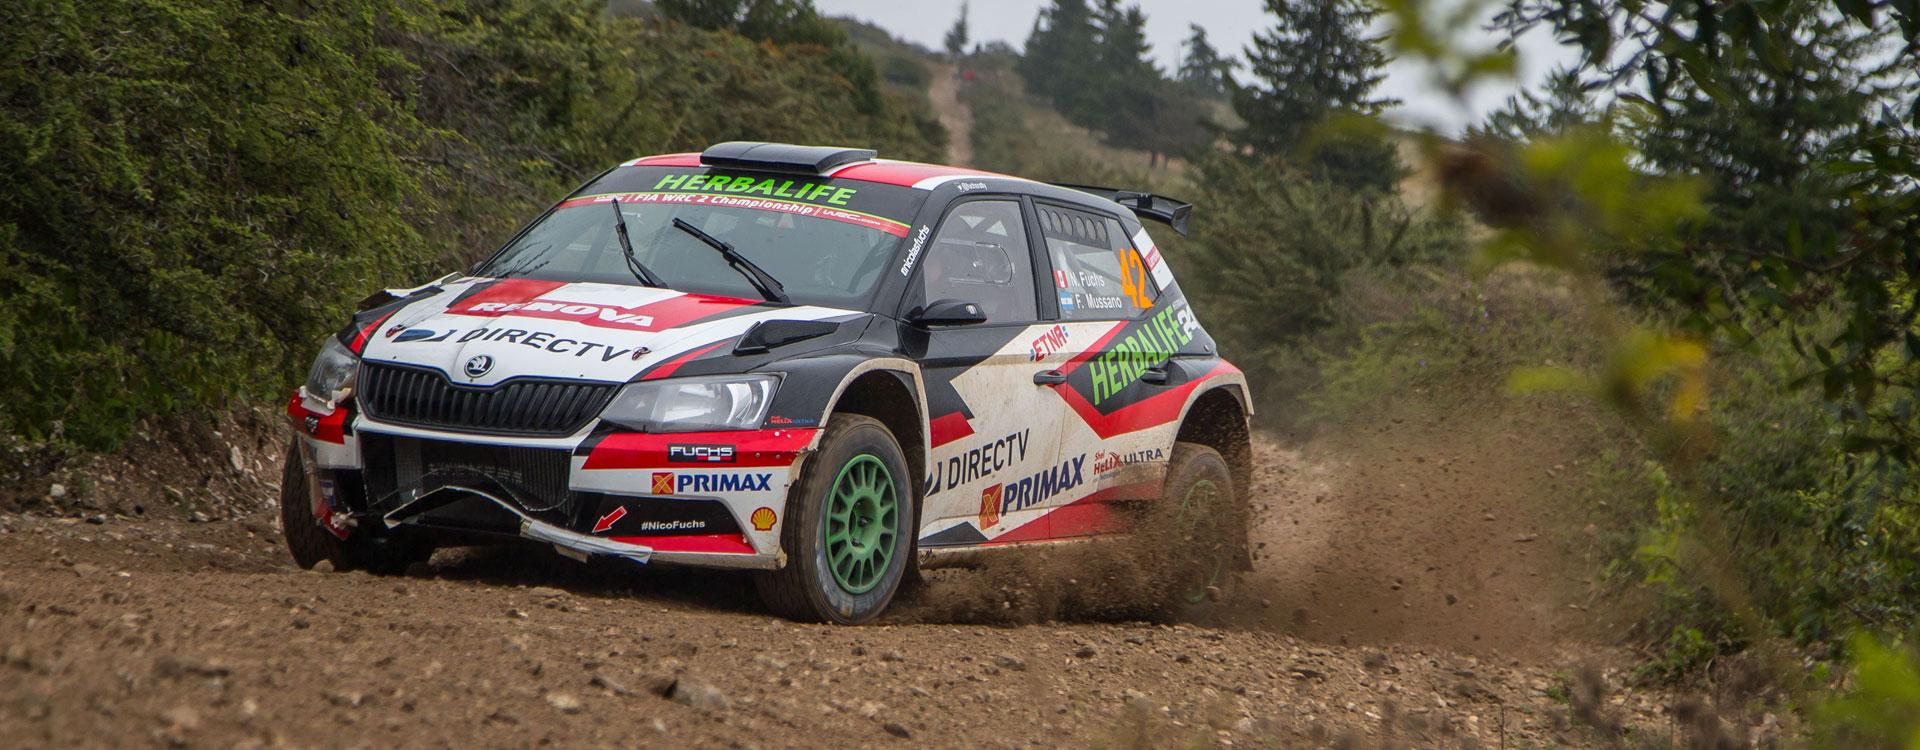 WRC Argentina: Three ŠKODA customer teams taking on the tough terrain